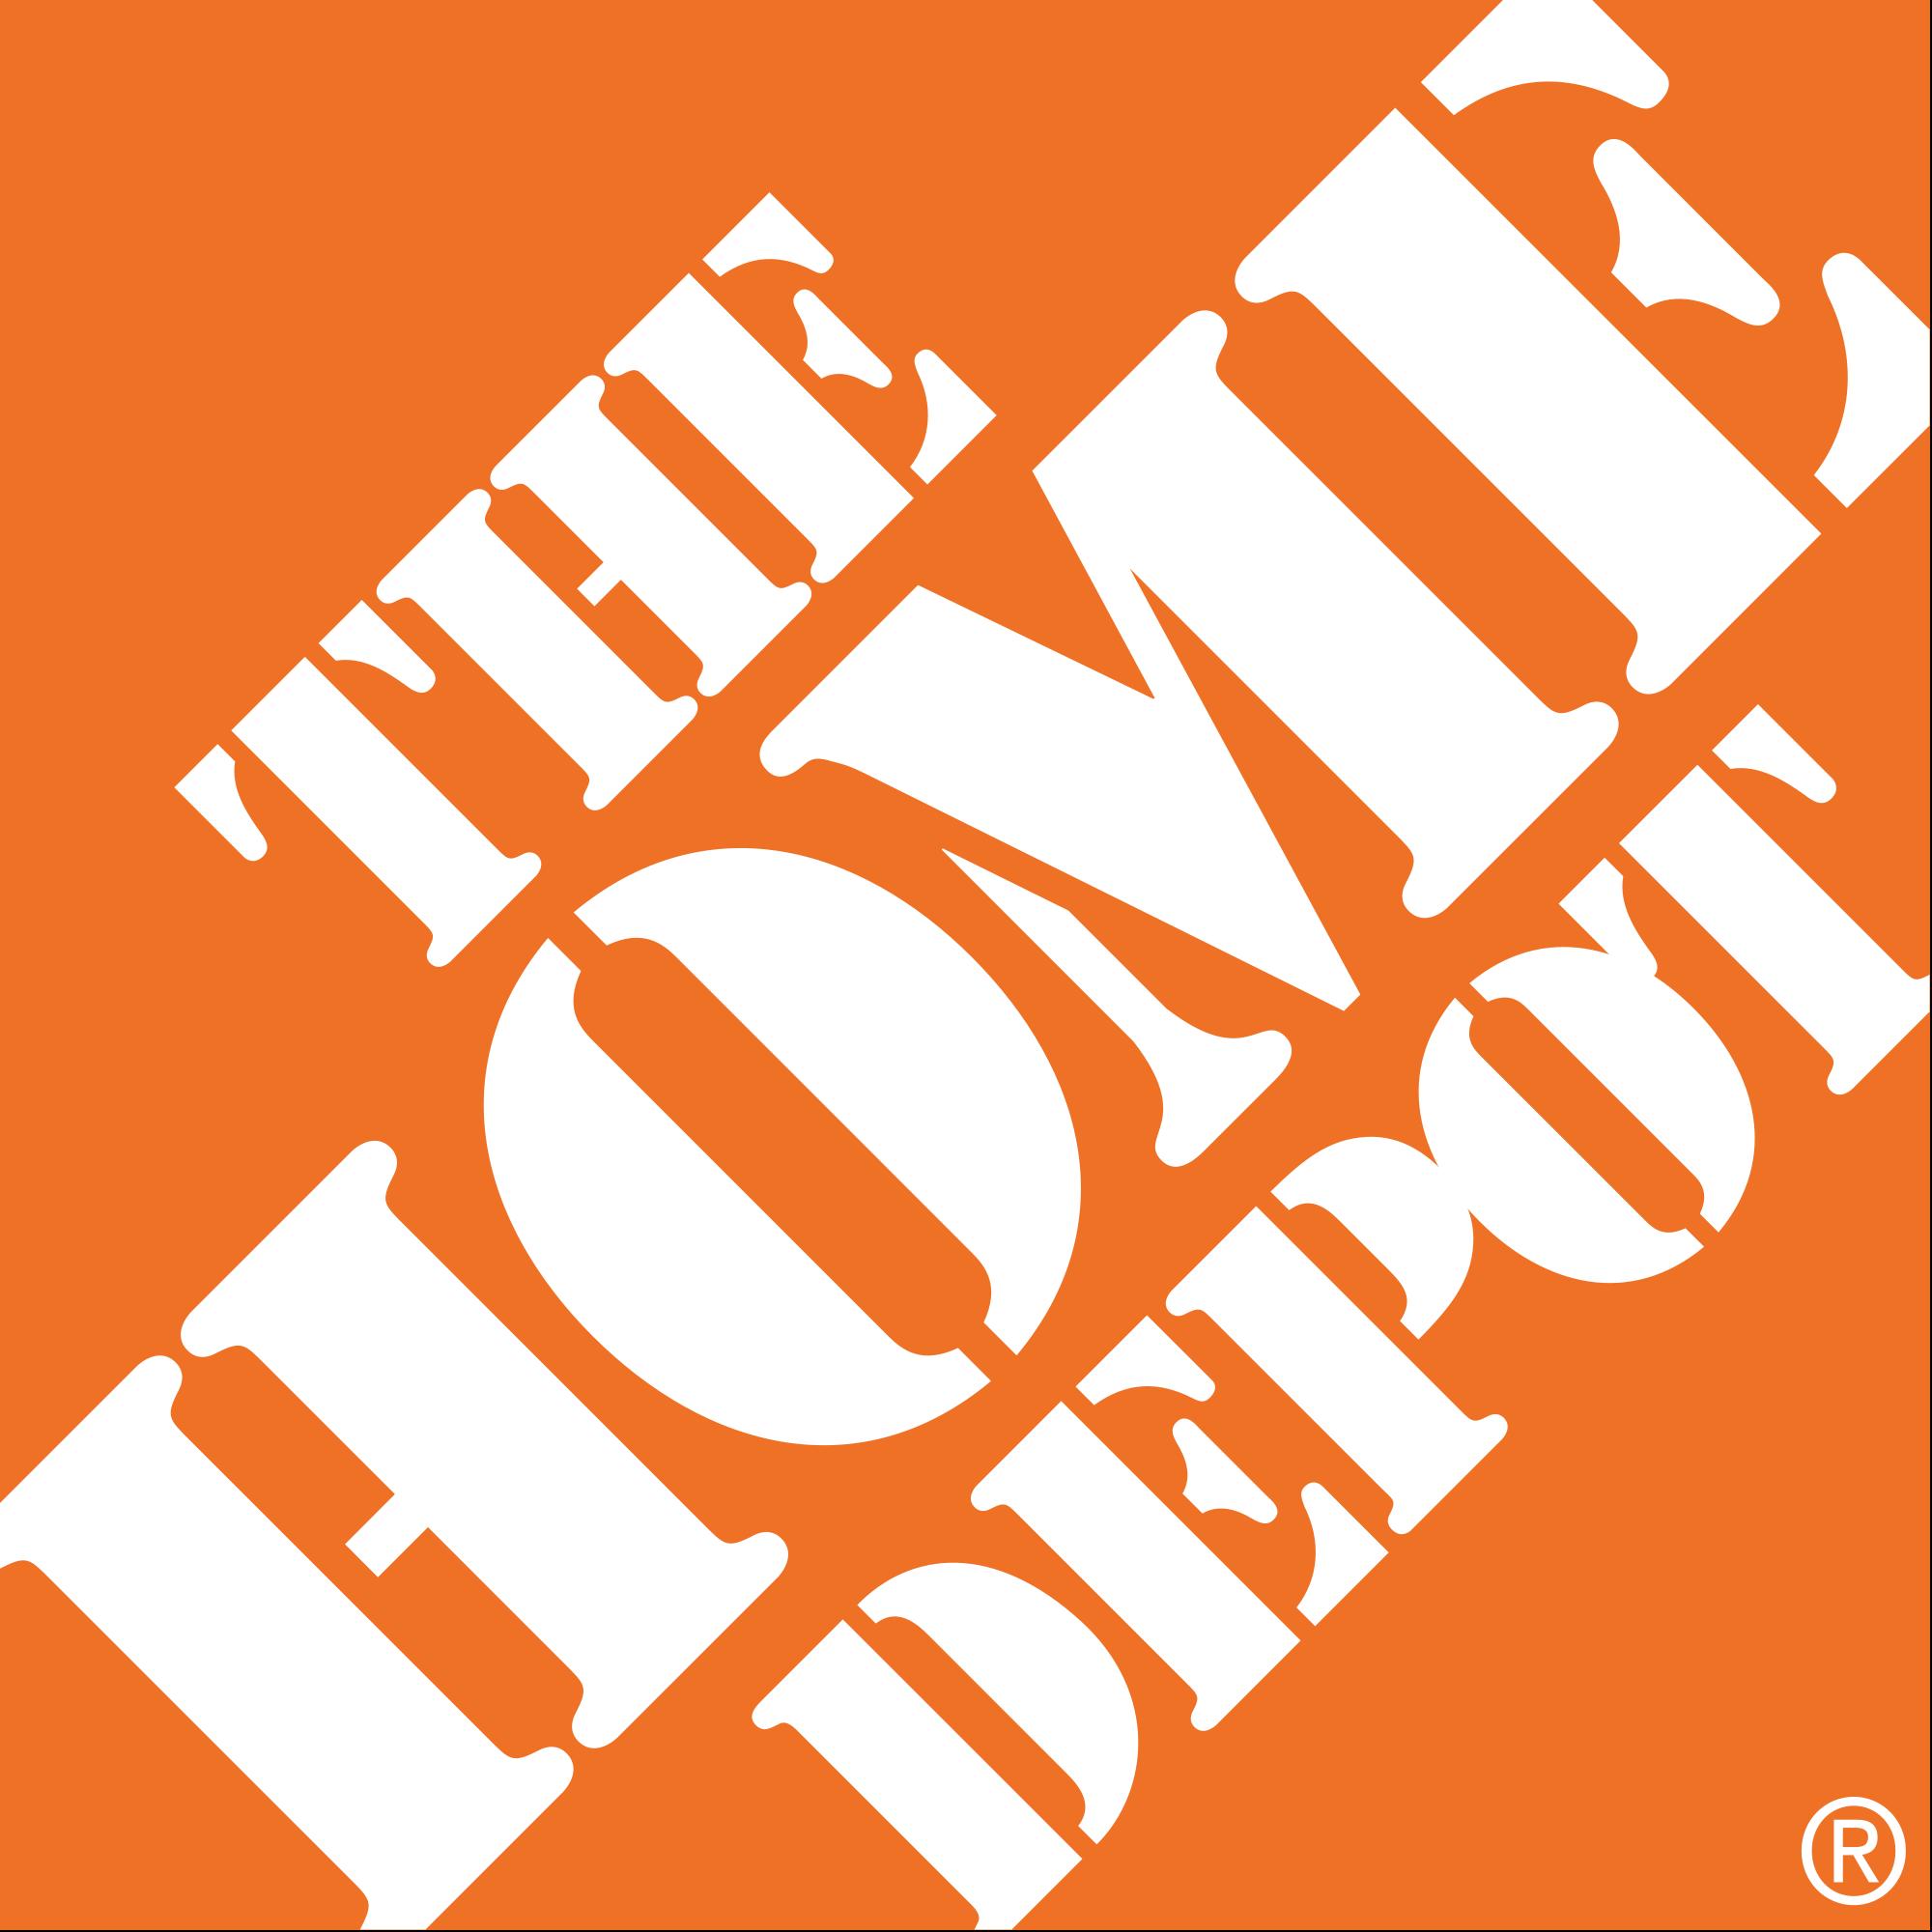 sacl_hd_home_depot_logo_2.jpeg